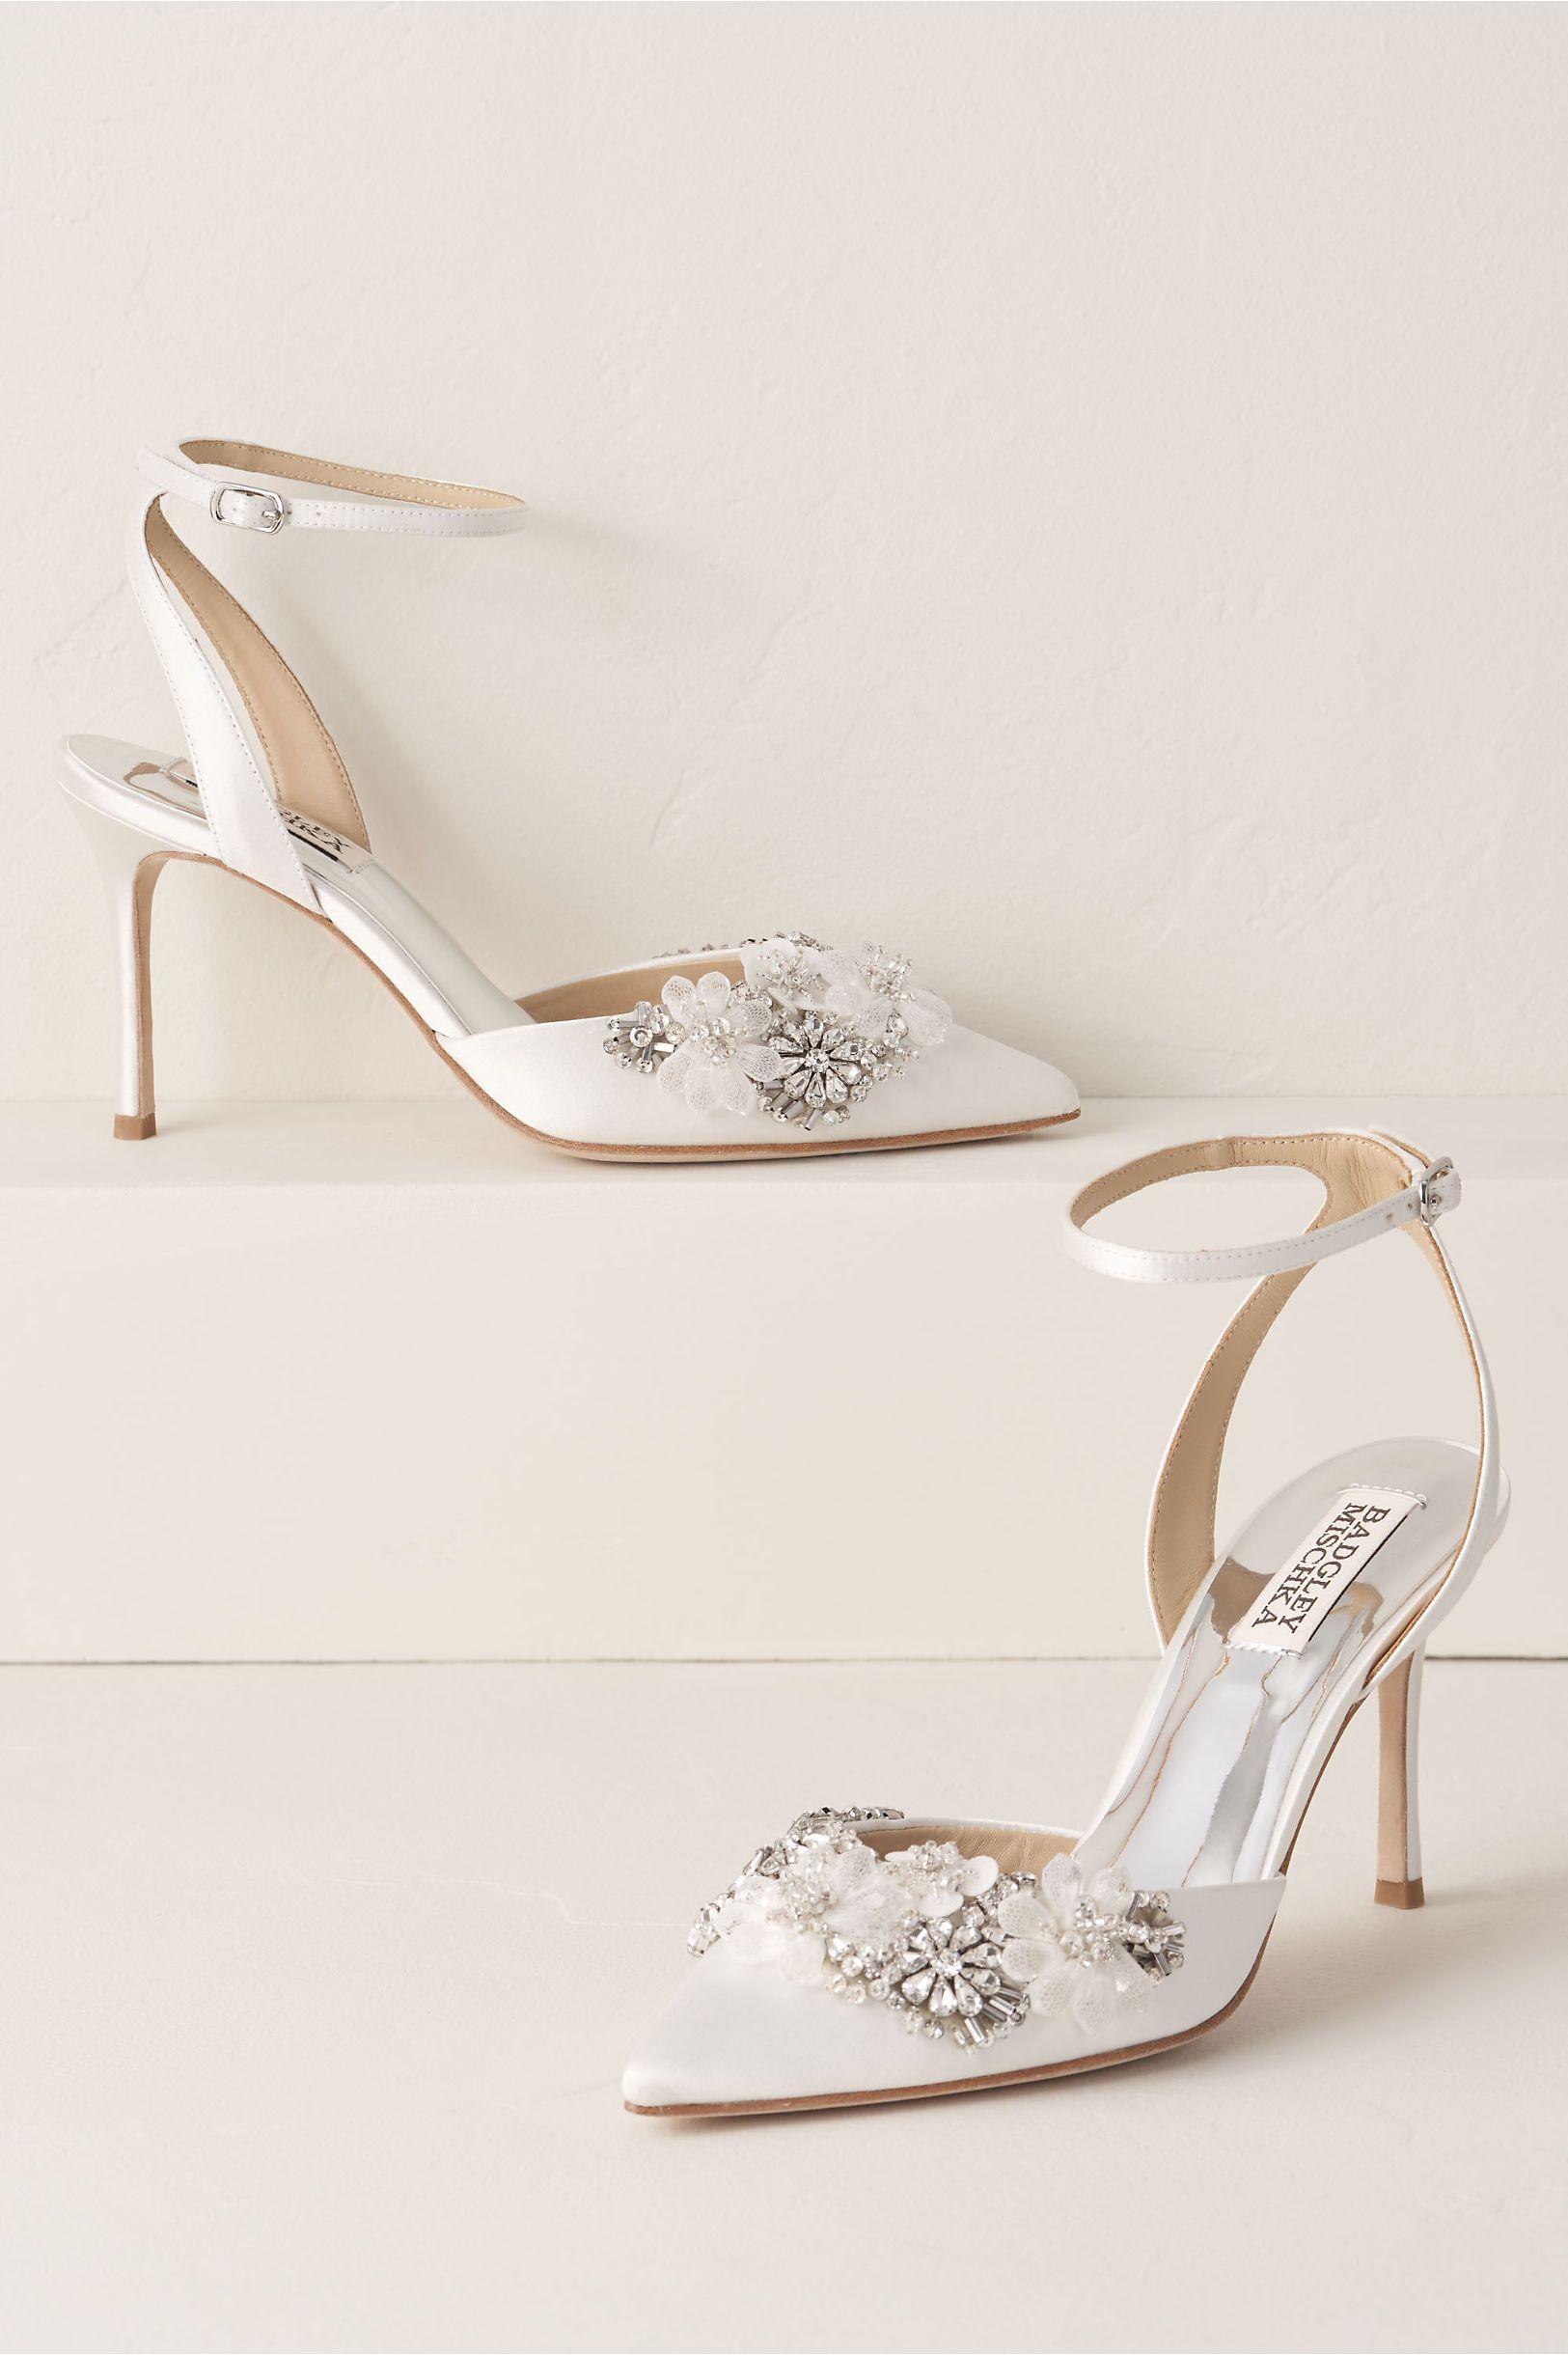 Badgley Mischka Alice Heels Wedding Shoes Bridal Shoes Designer Wedding Shoes